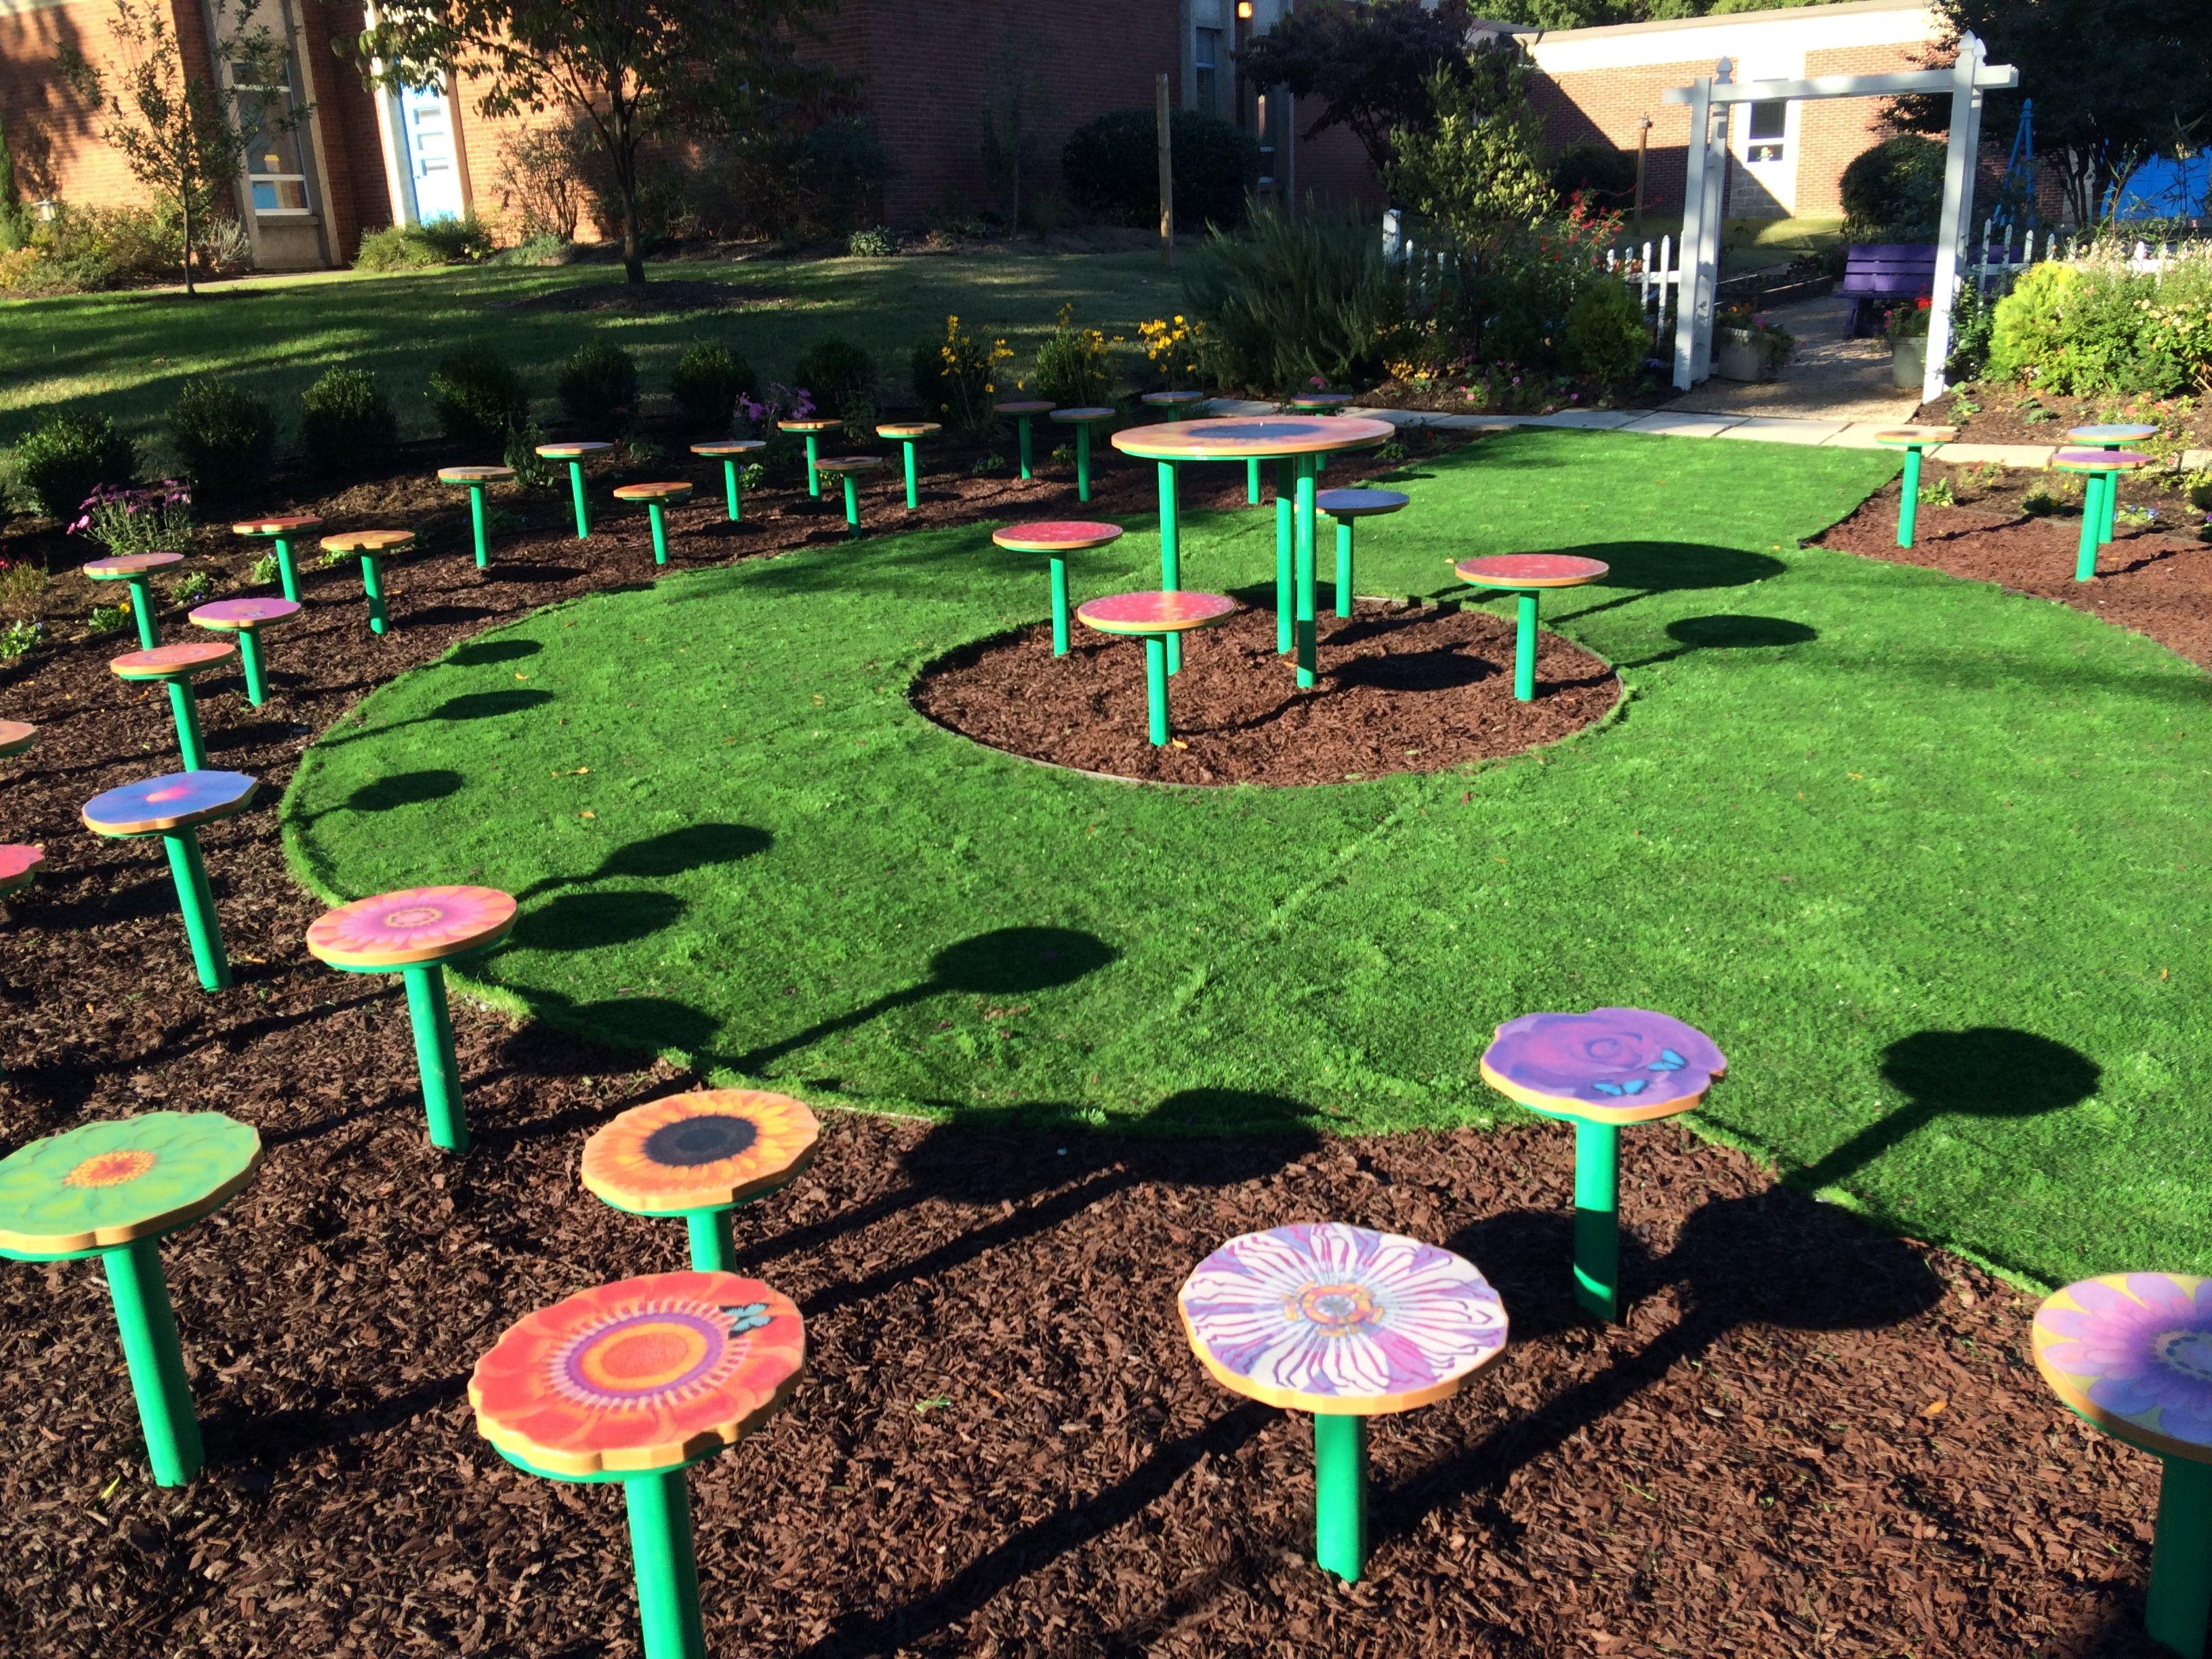 Chimborazo Elementary School Project Flower Garden Design Floral Design School Simple Garden Designs